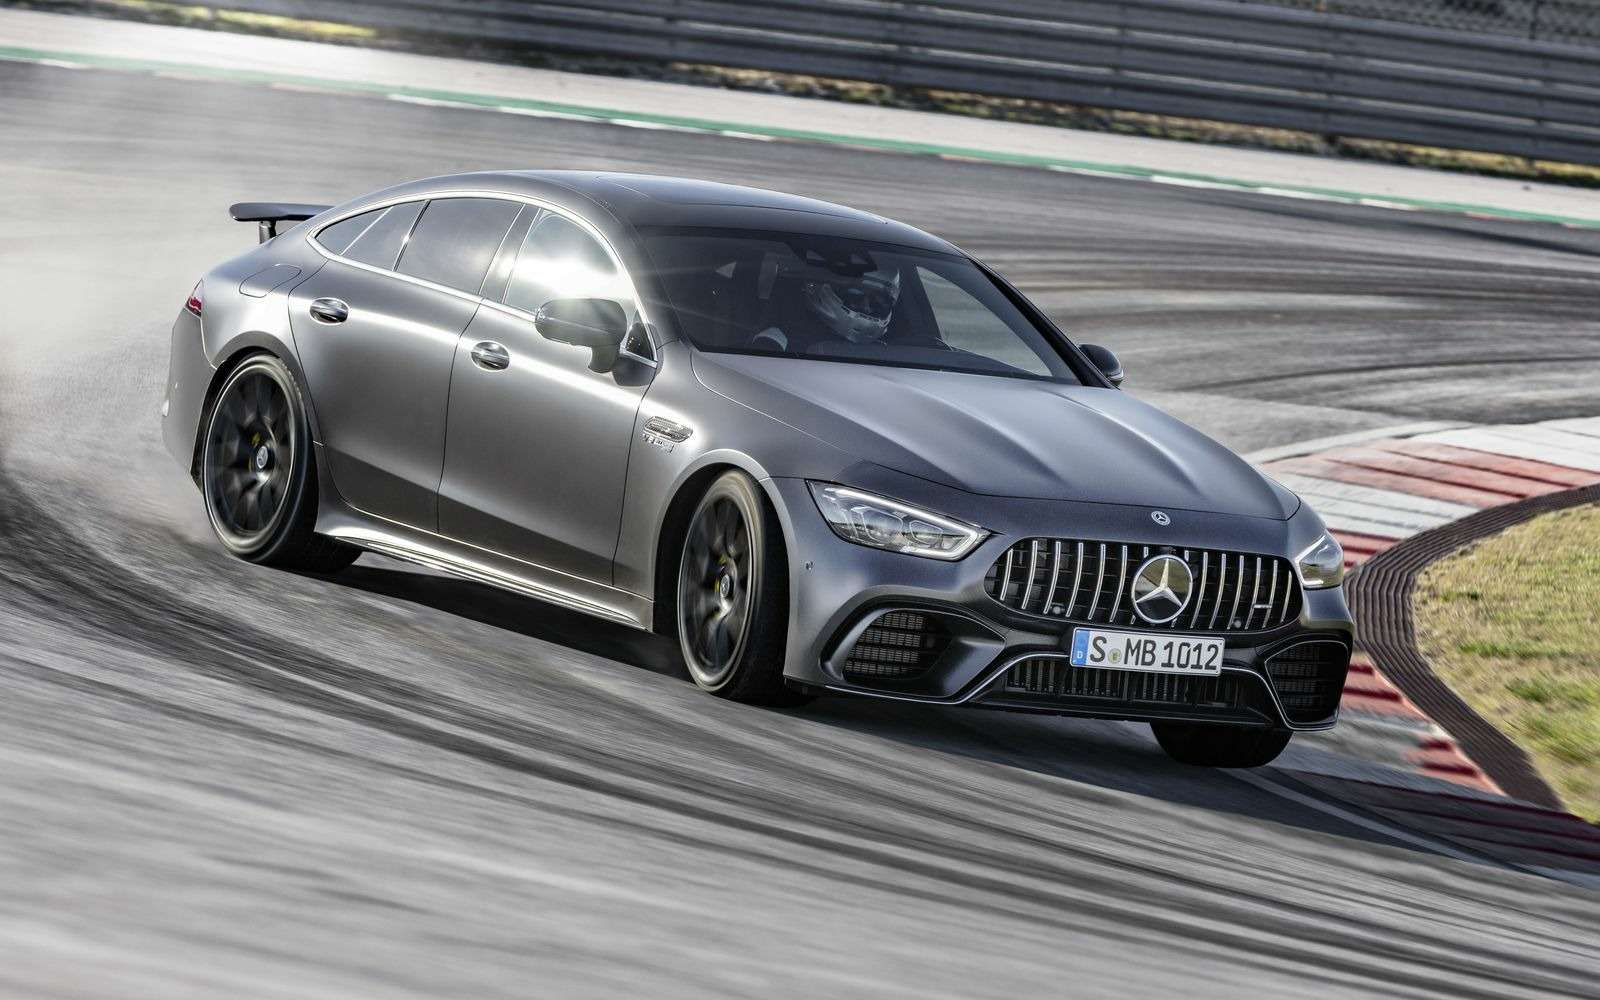 Подмена! Пятидверный Mercedes-AMG GTполучил «тележку» Е-класса— фото 851531